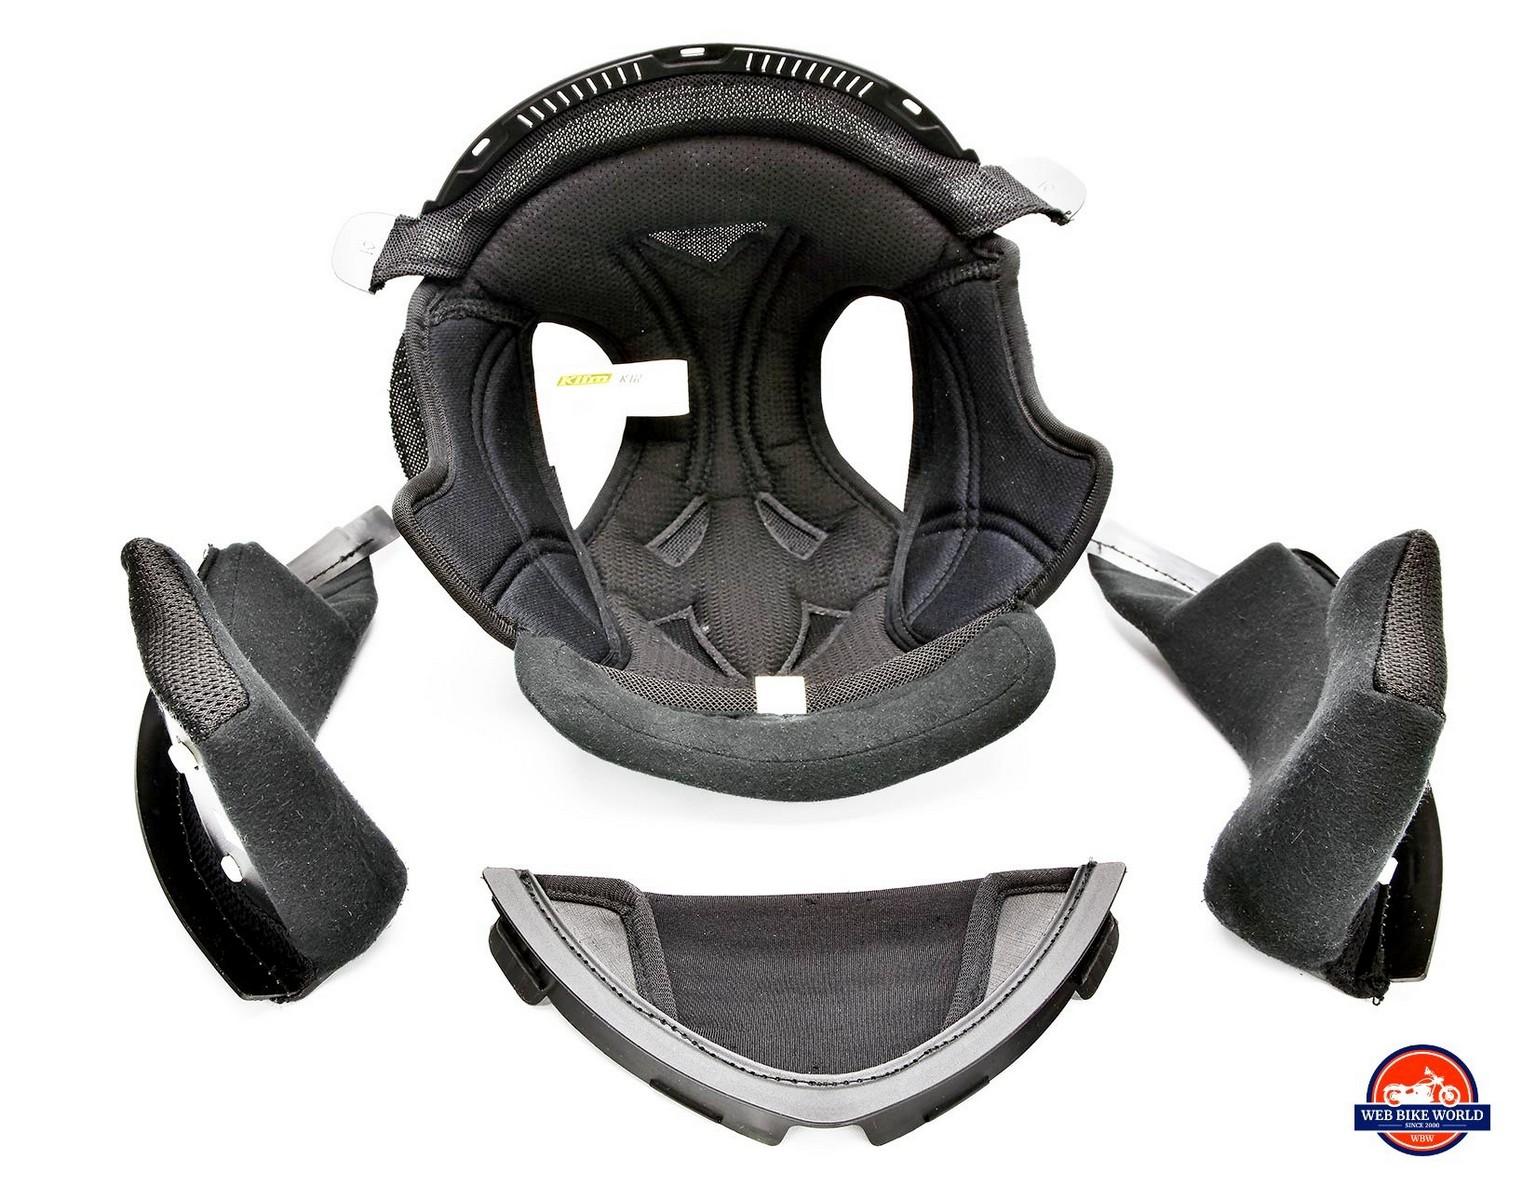 Klim K1R helmet interior padding.